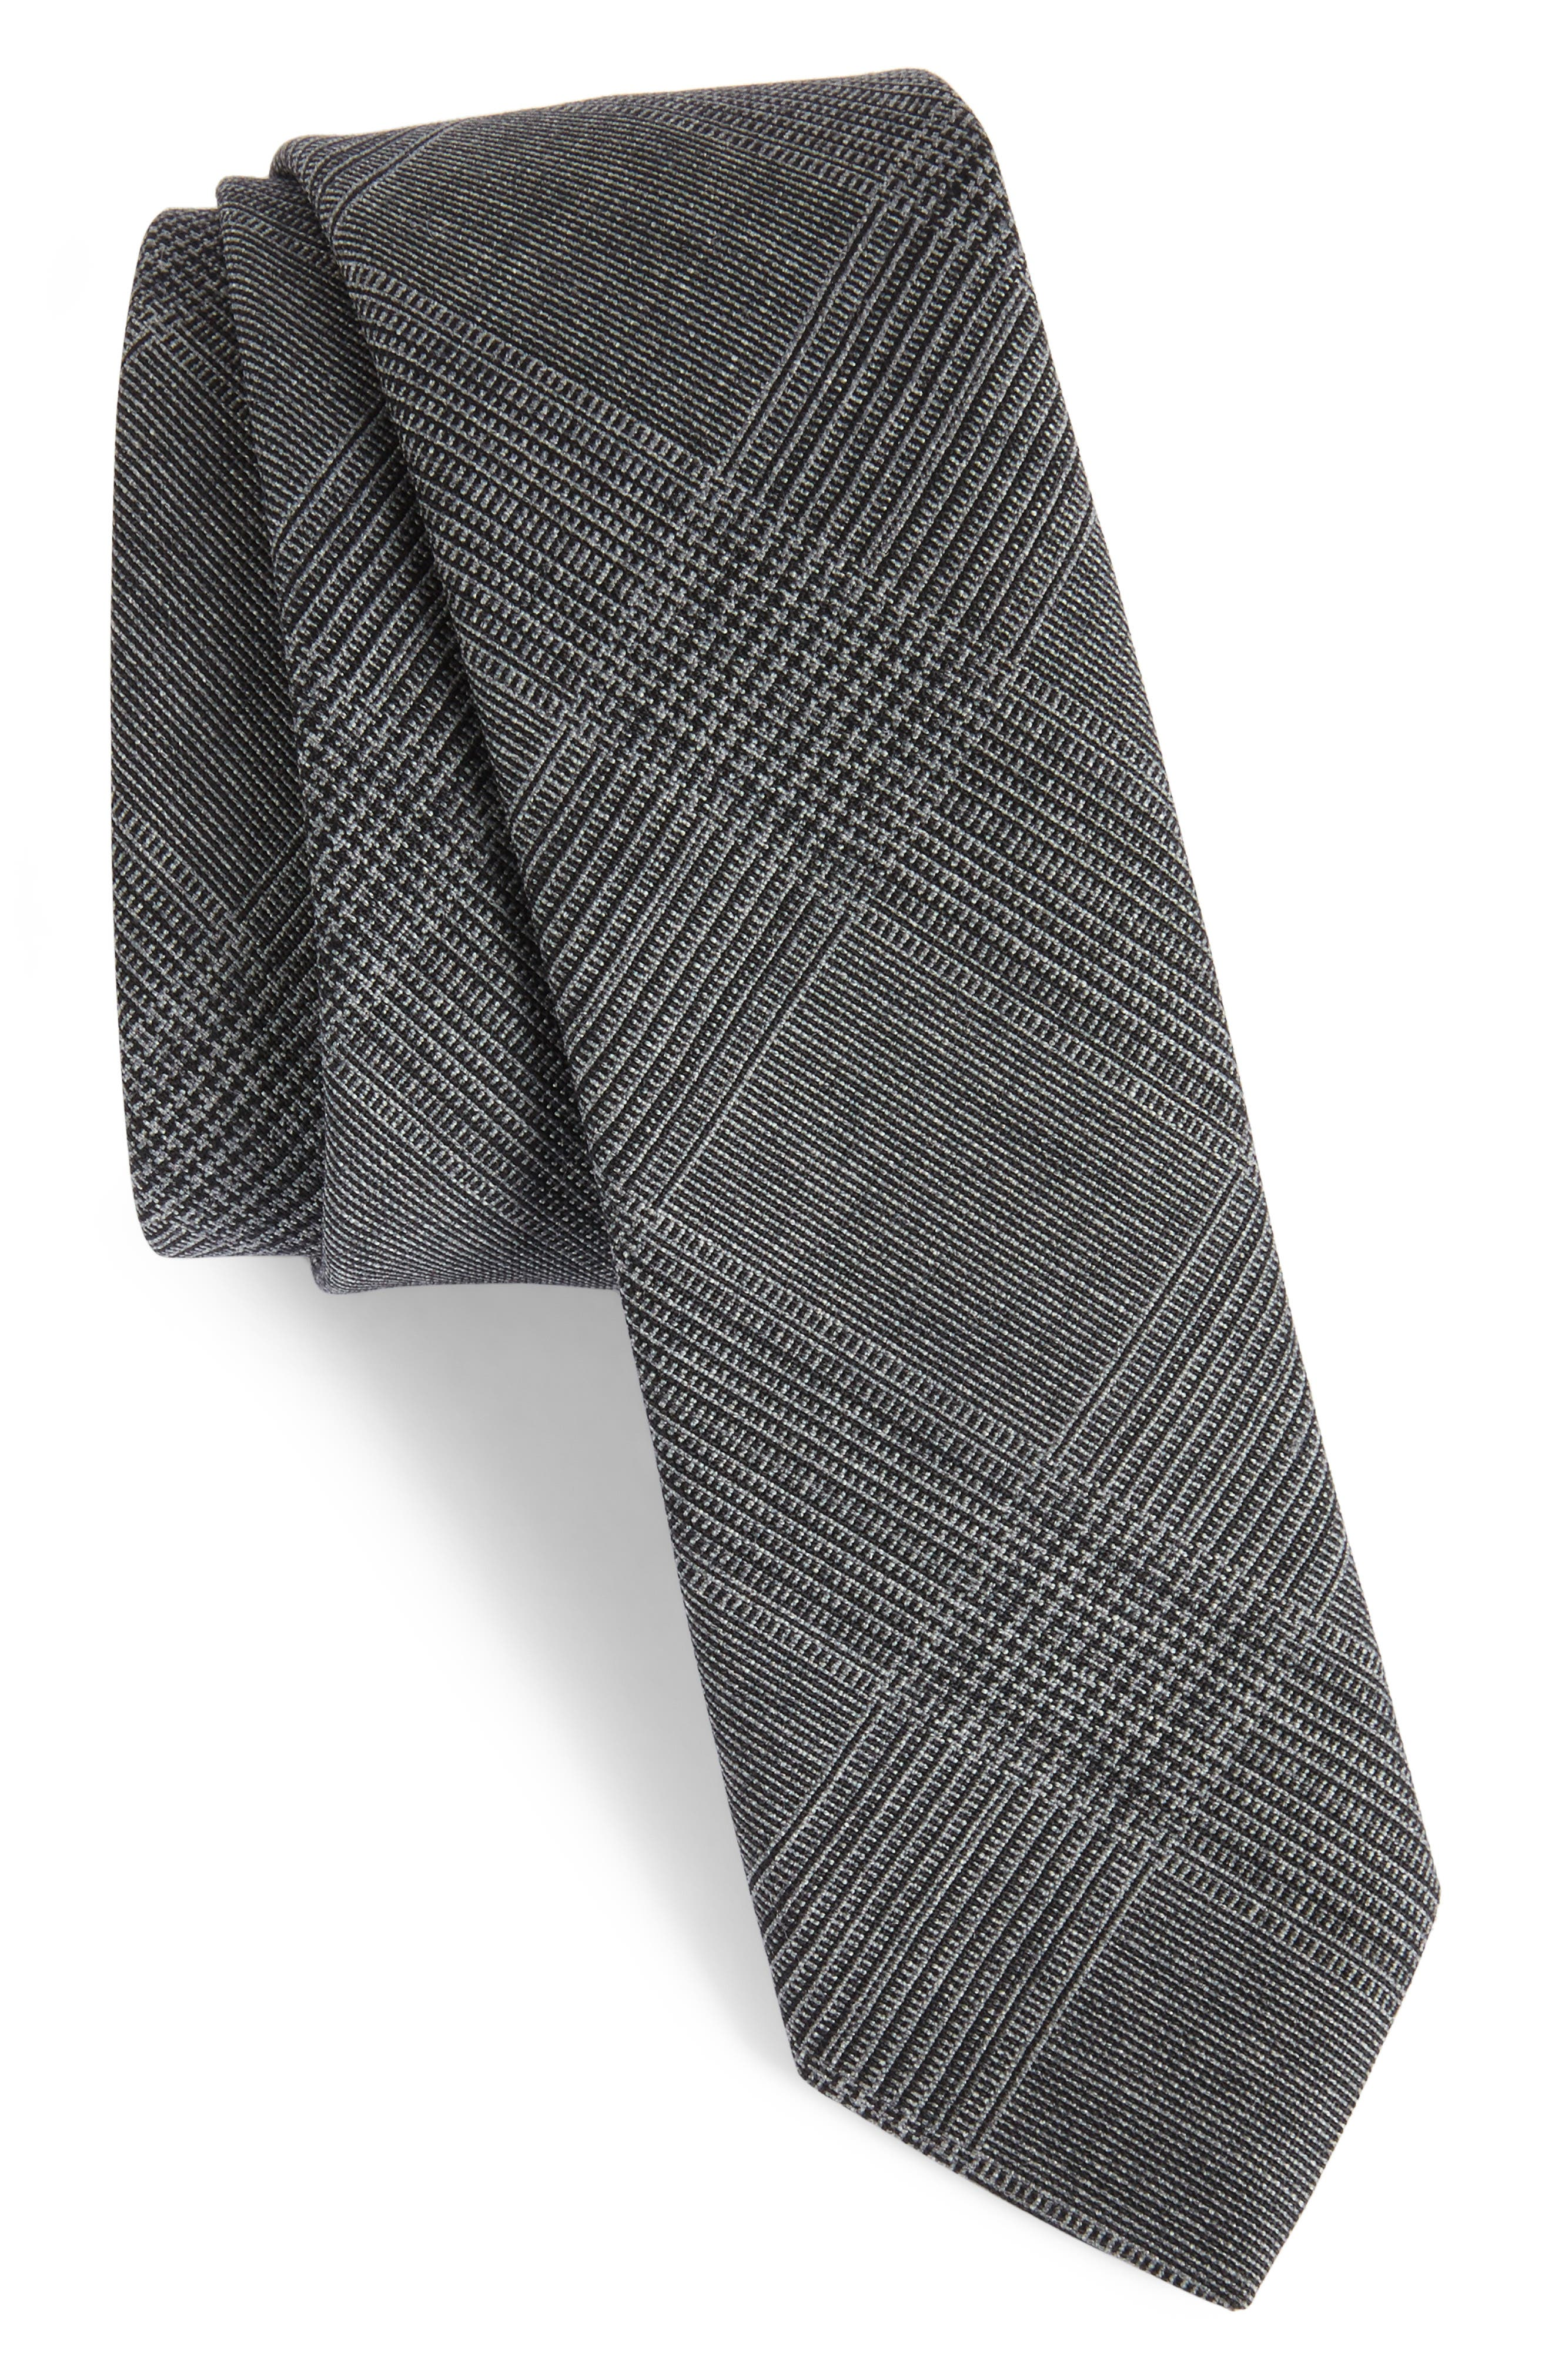 Glen Plaid Wool Skinny Tie,                             Main thumbnail 1, color,                             Charcoal